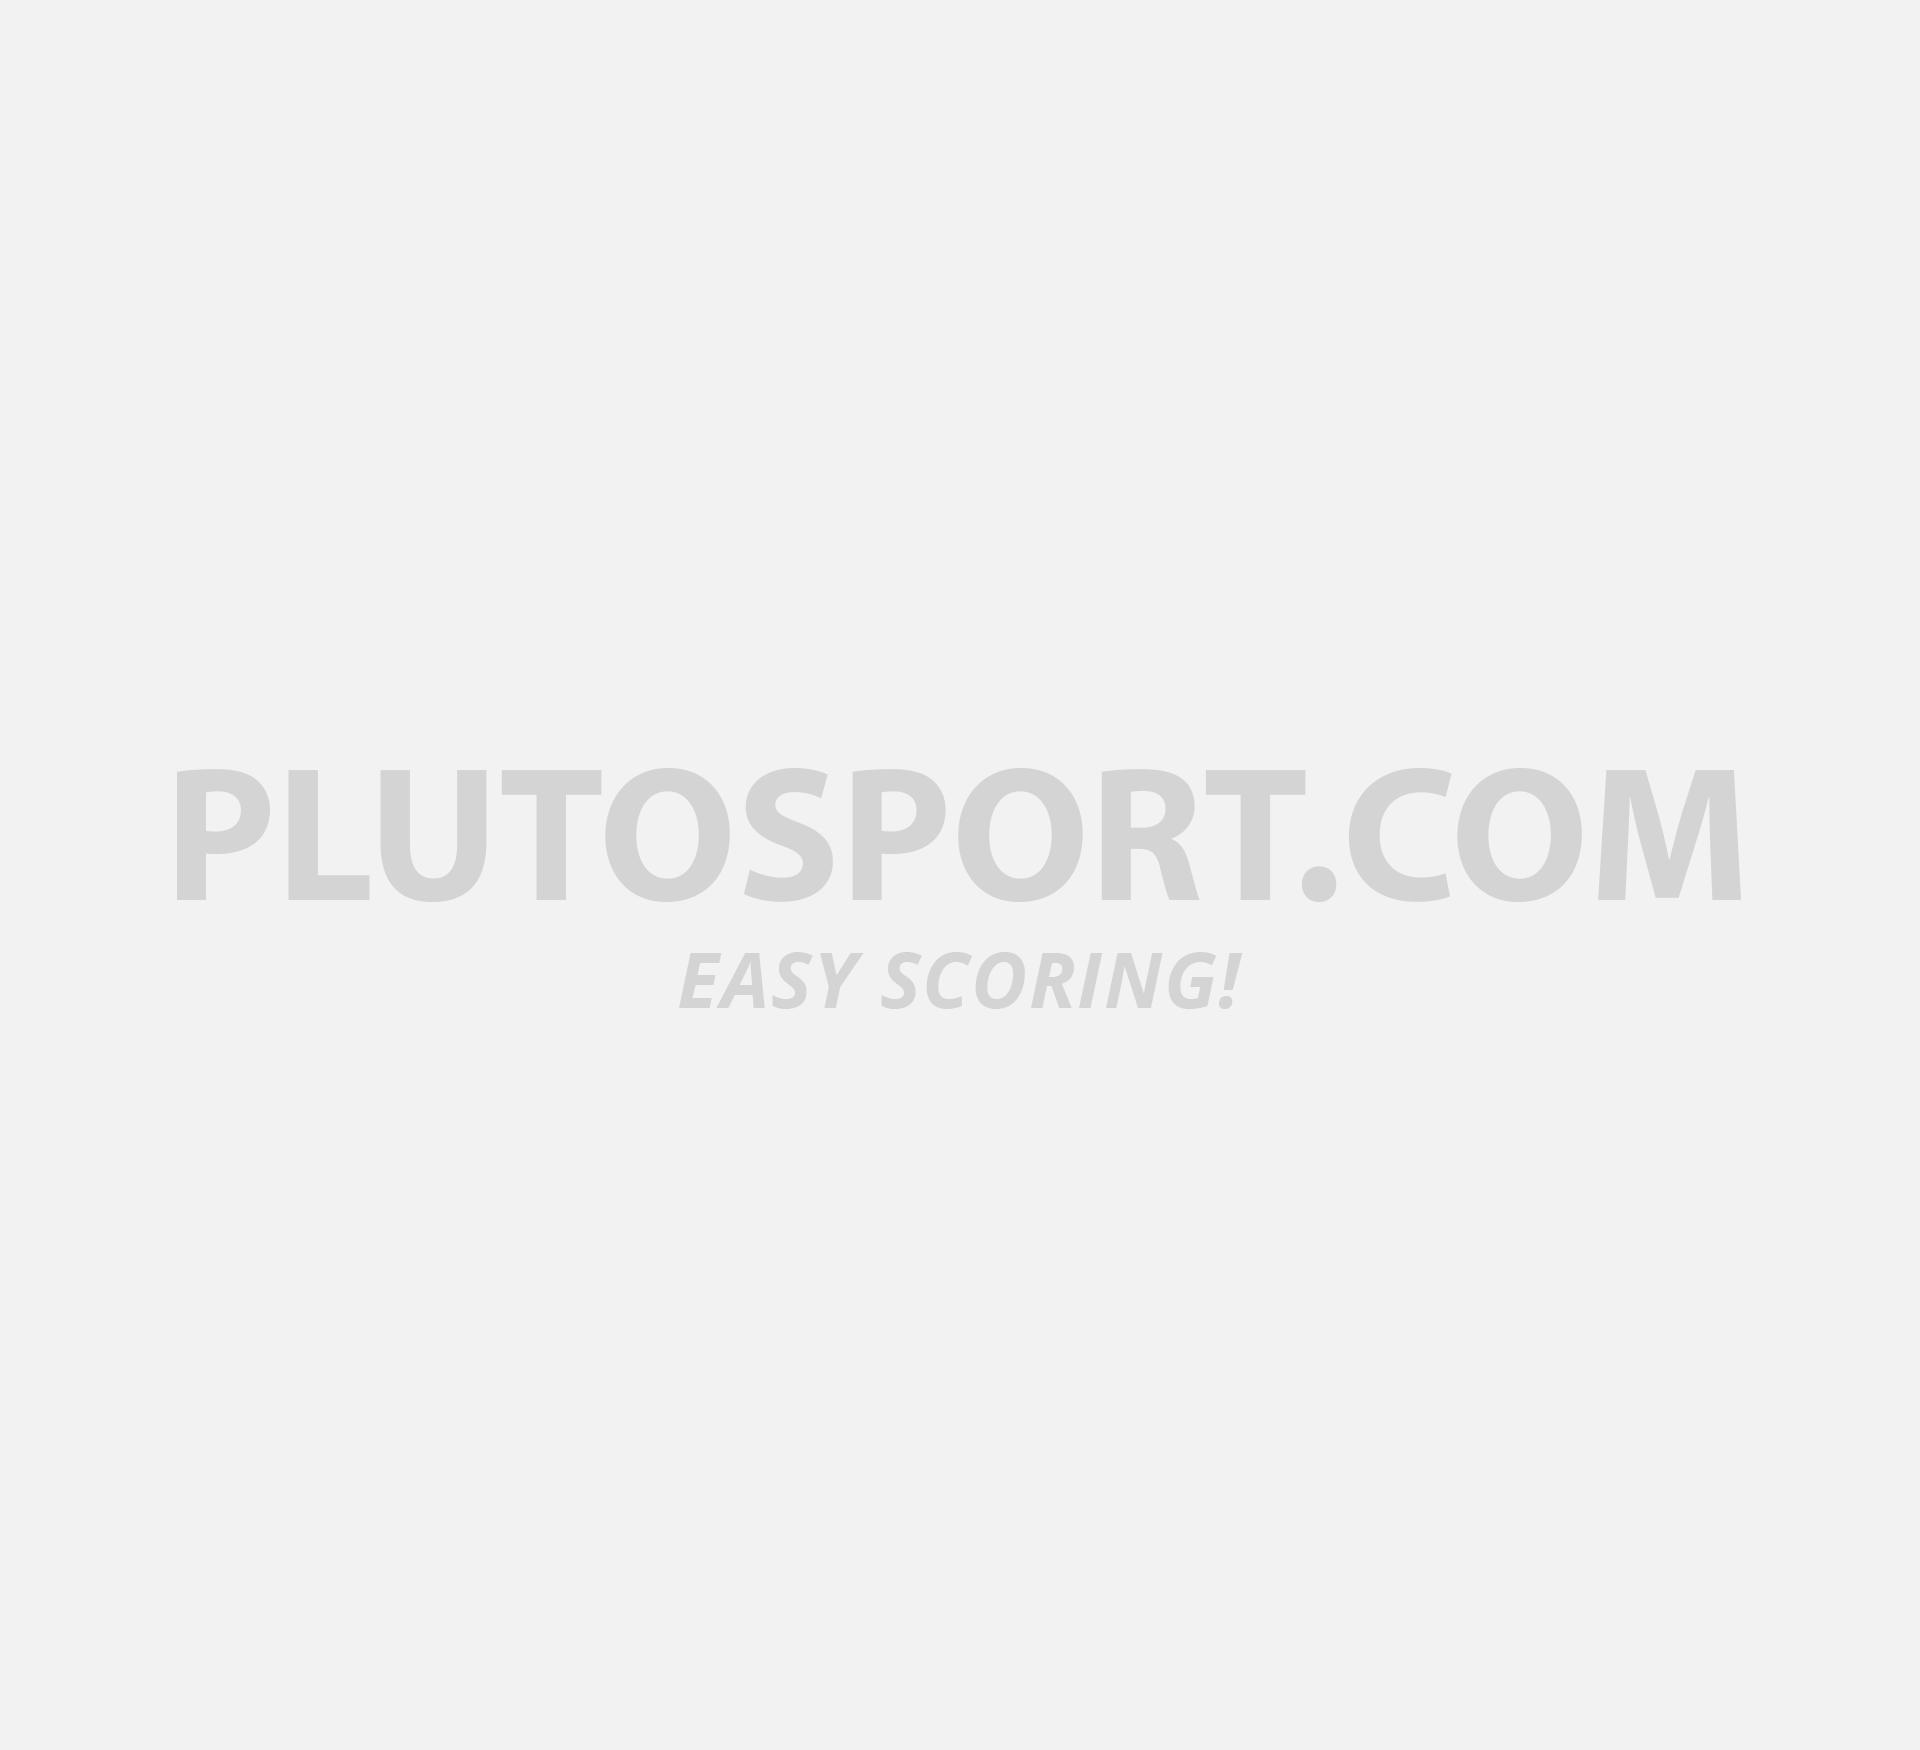 huge selection of 96800 ccec1 Puma BVB Borussia Dortmund Training Shirt